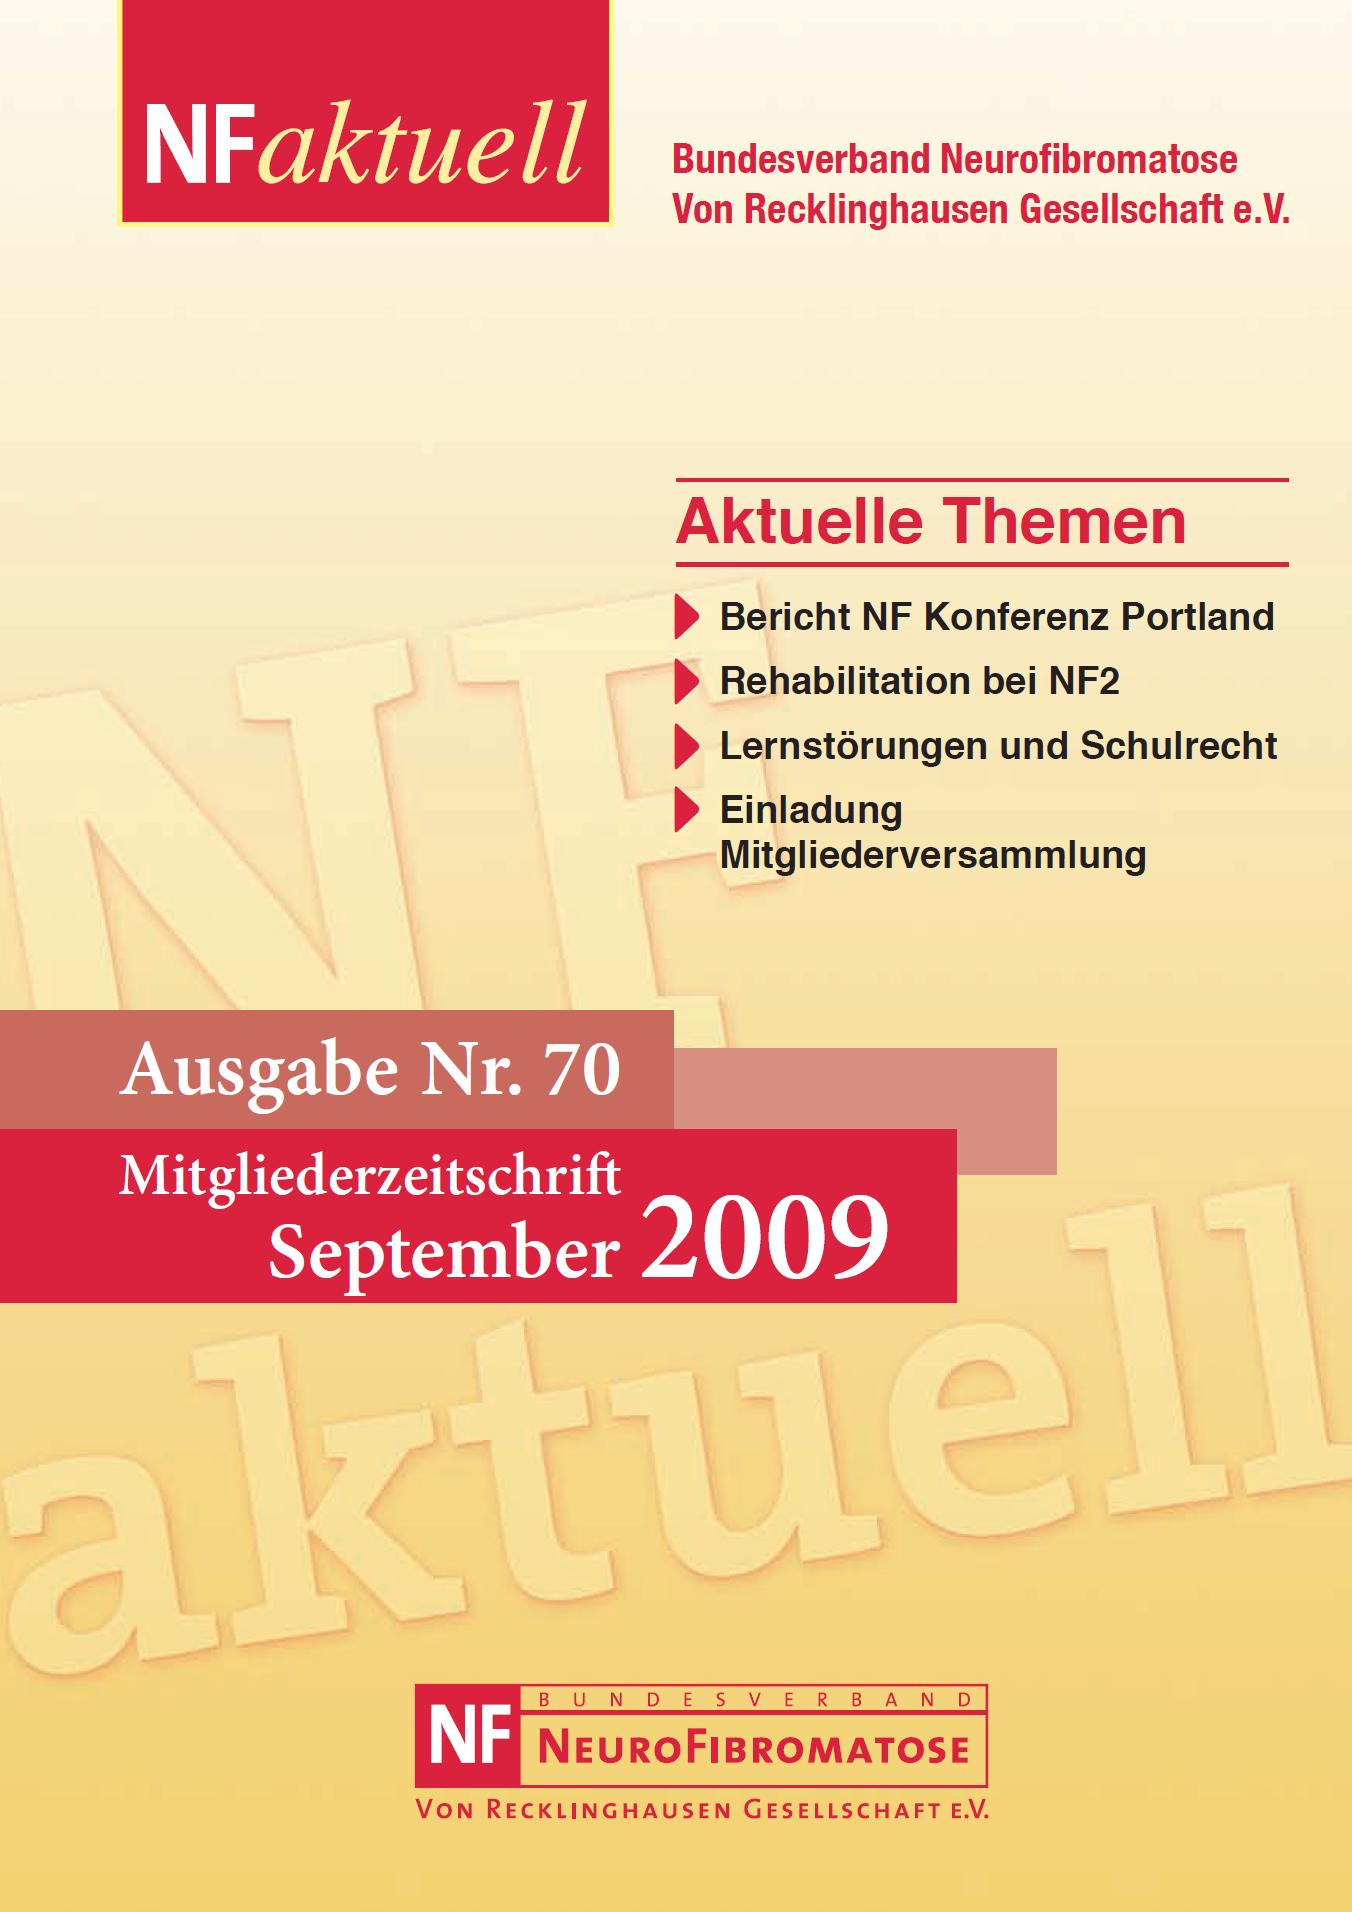 NFaktuell-70-september-2009-titel